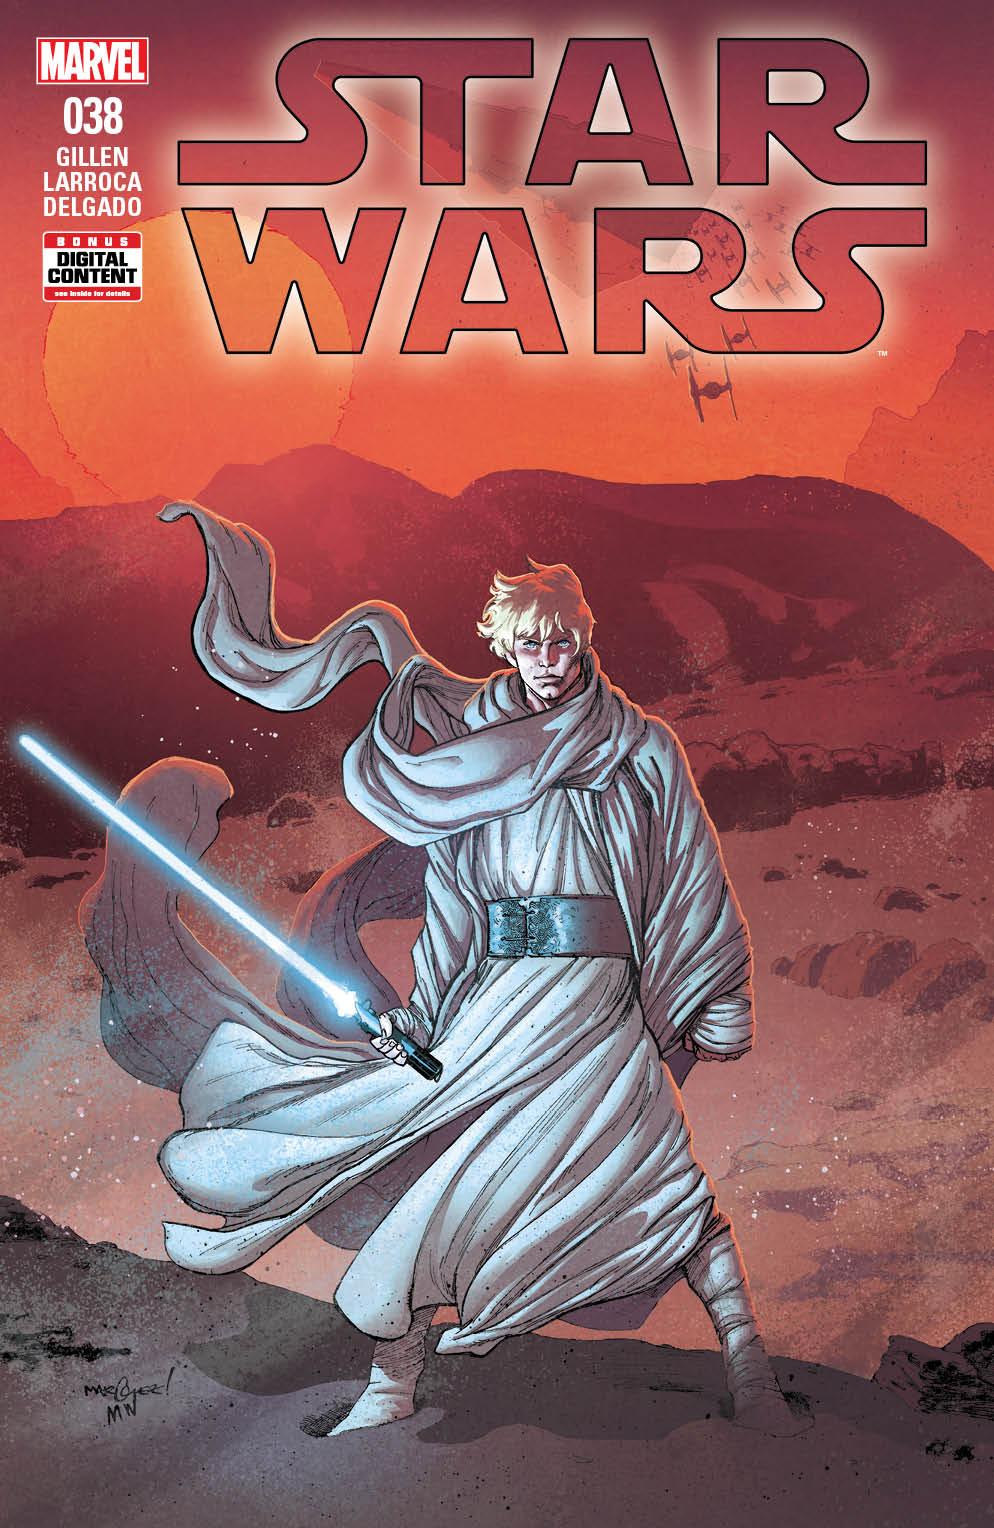 Kieron Gillen and Salvador Larocca Unleash a New Story in Star Wars #38!